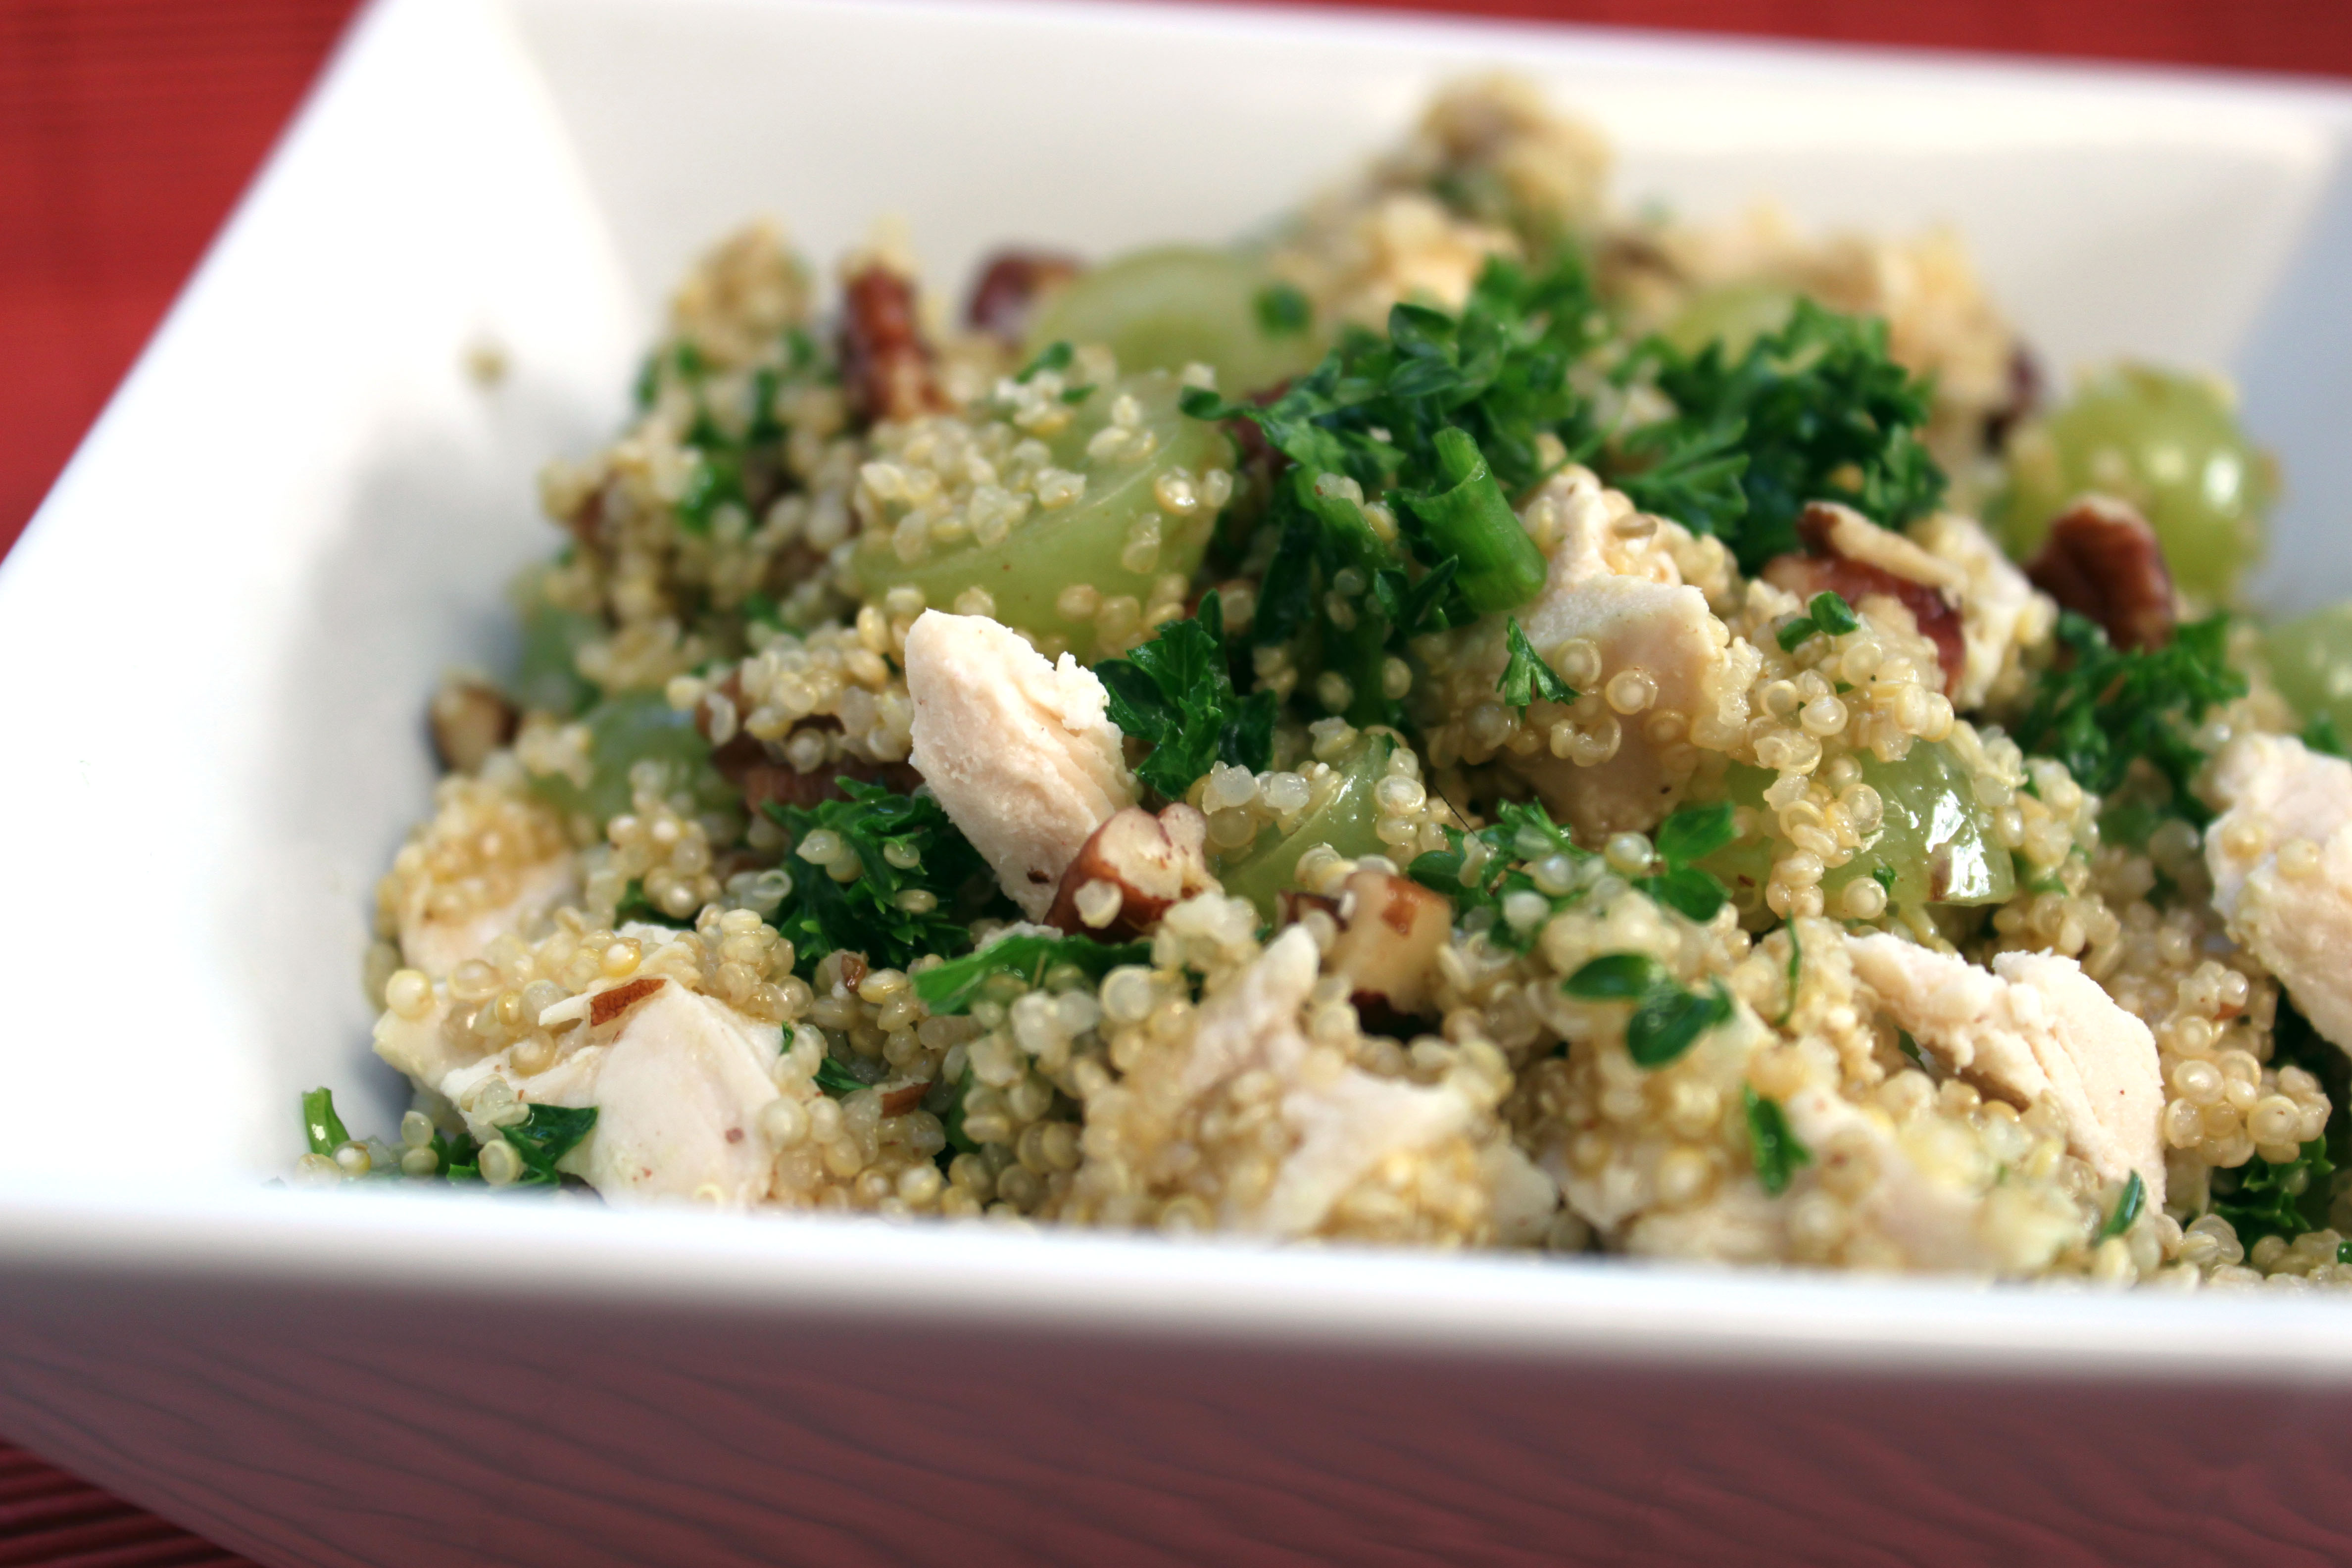 Chicken And Quinoa Recipe Healthy  Healthy Chicken and Quinoa Salad Kris M Beal